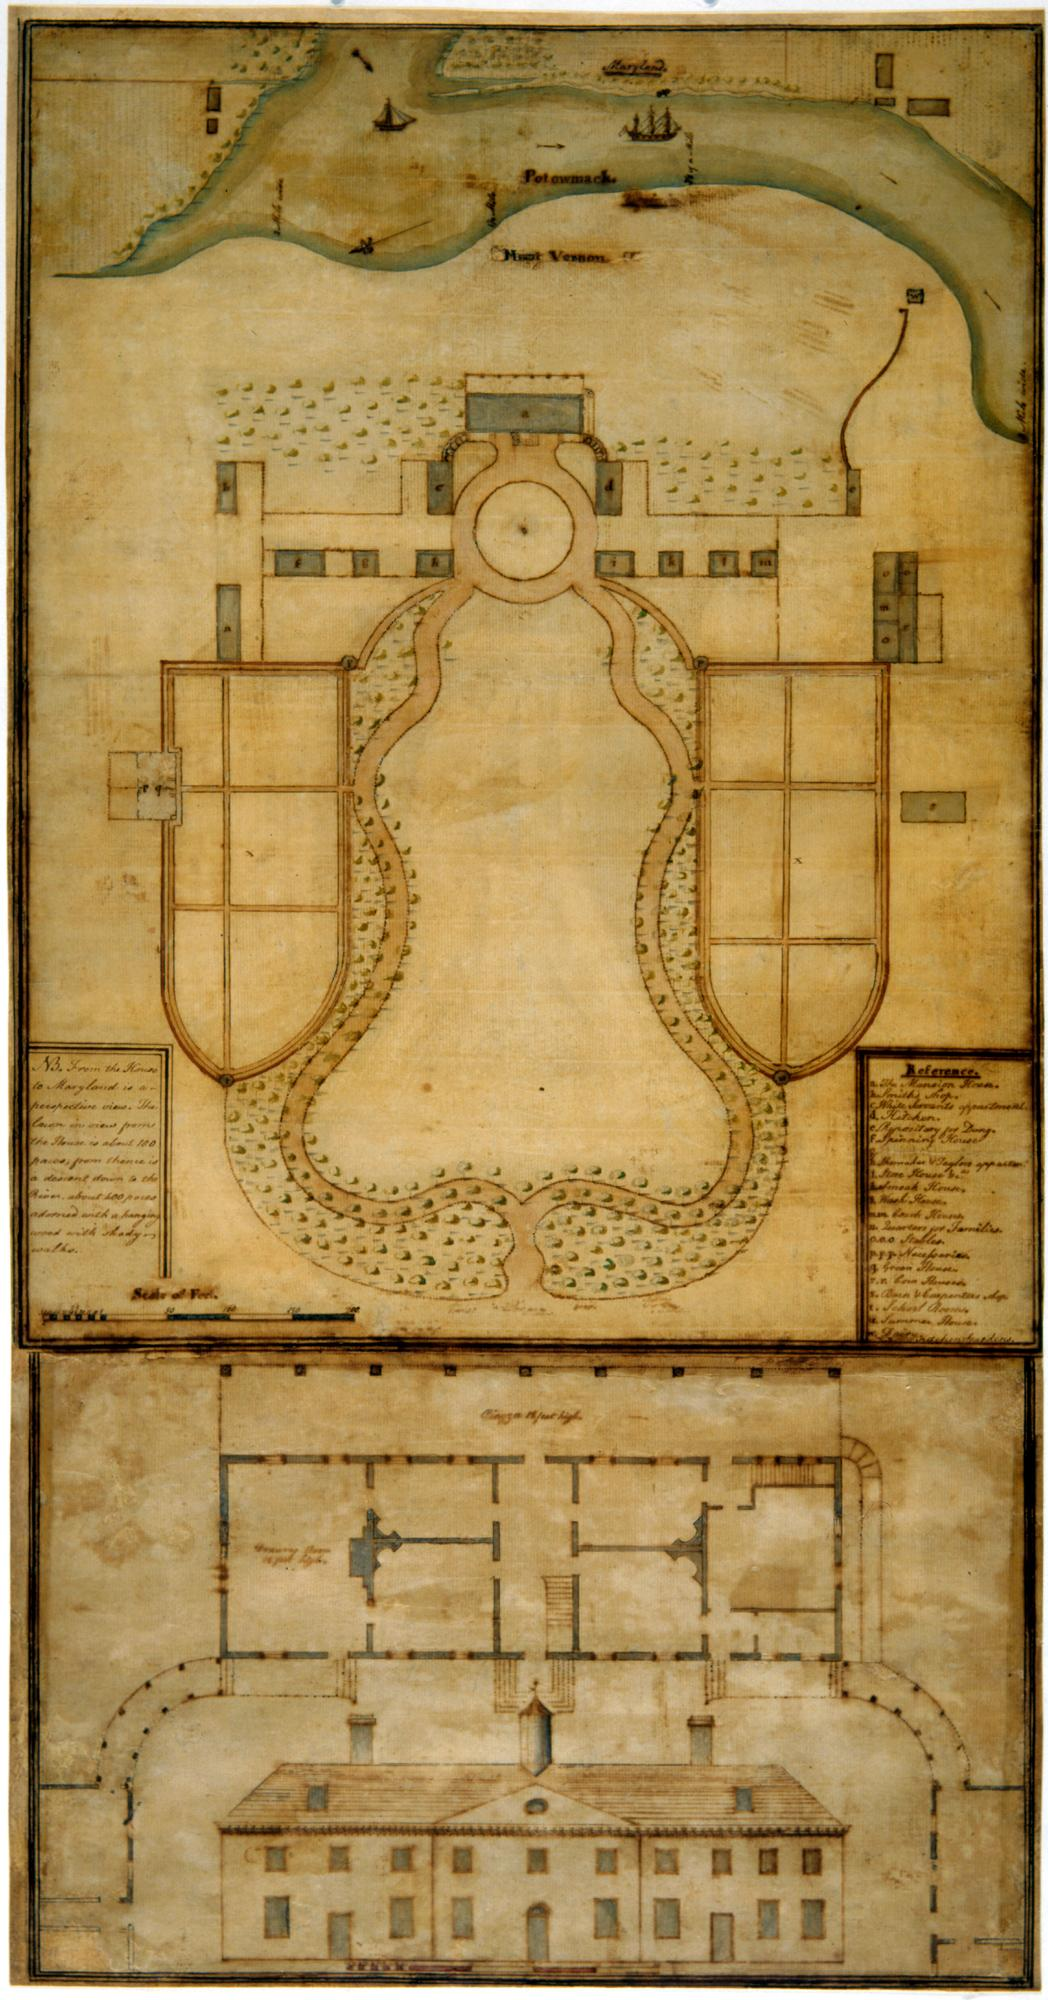 Samuel Vaughan, Plan of Mount Vernon, 1787, ink and watercolor, W-1434, MVLA.